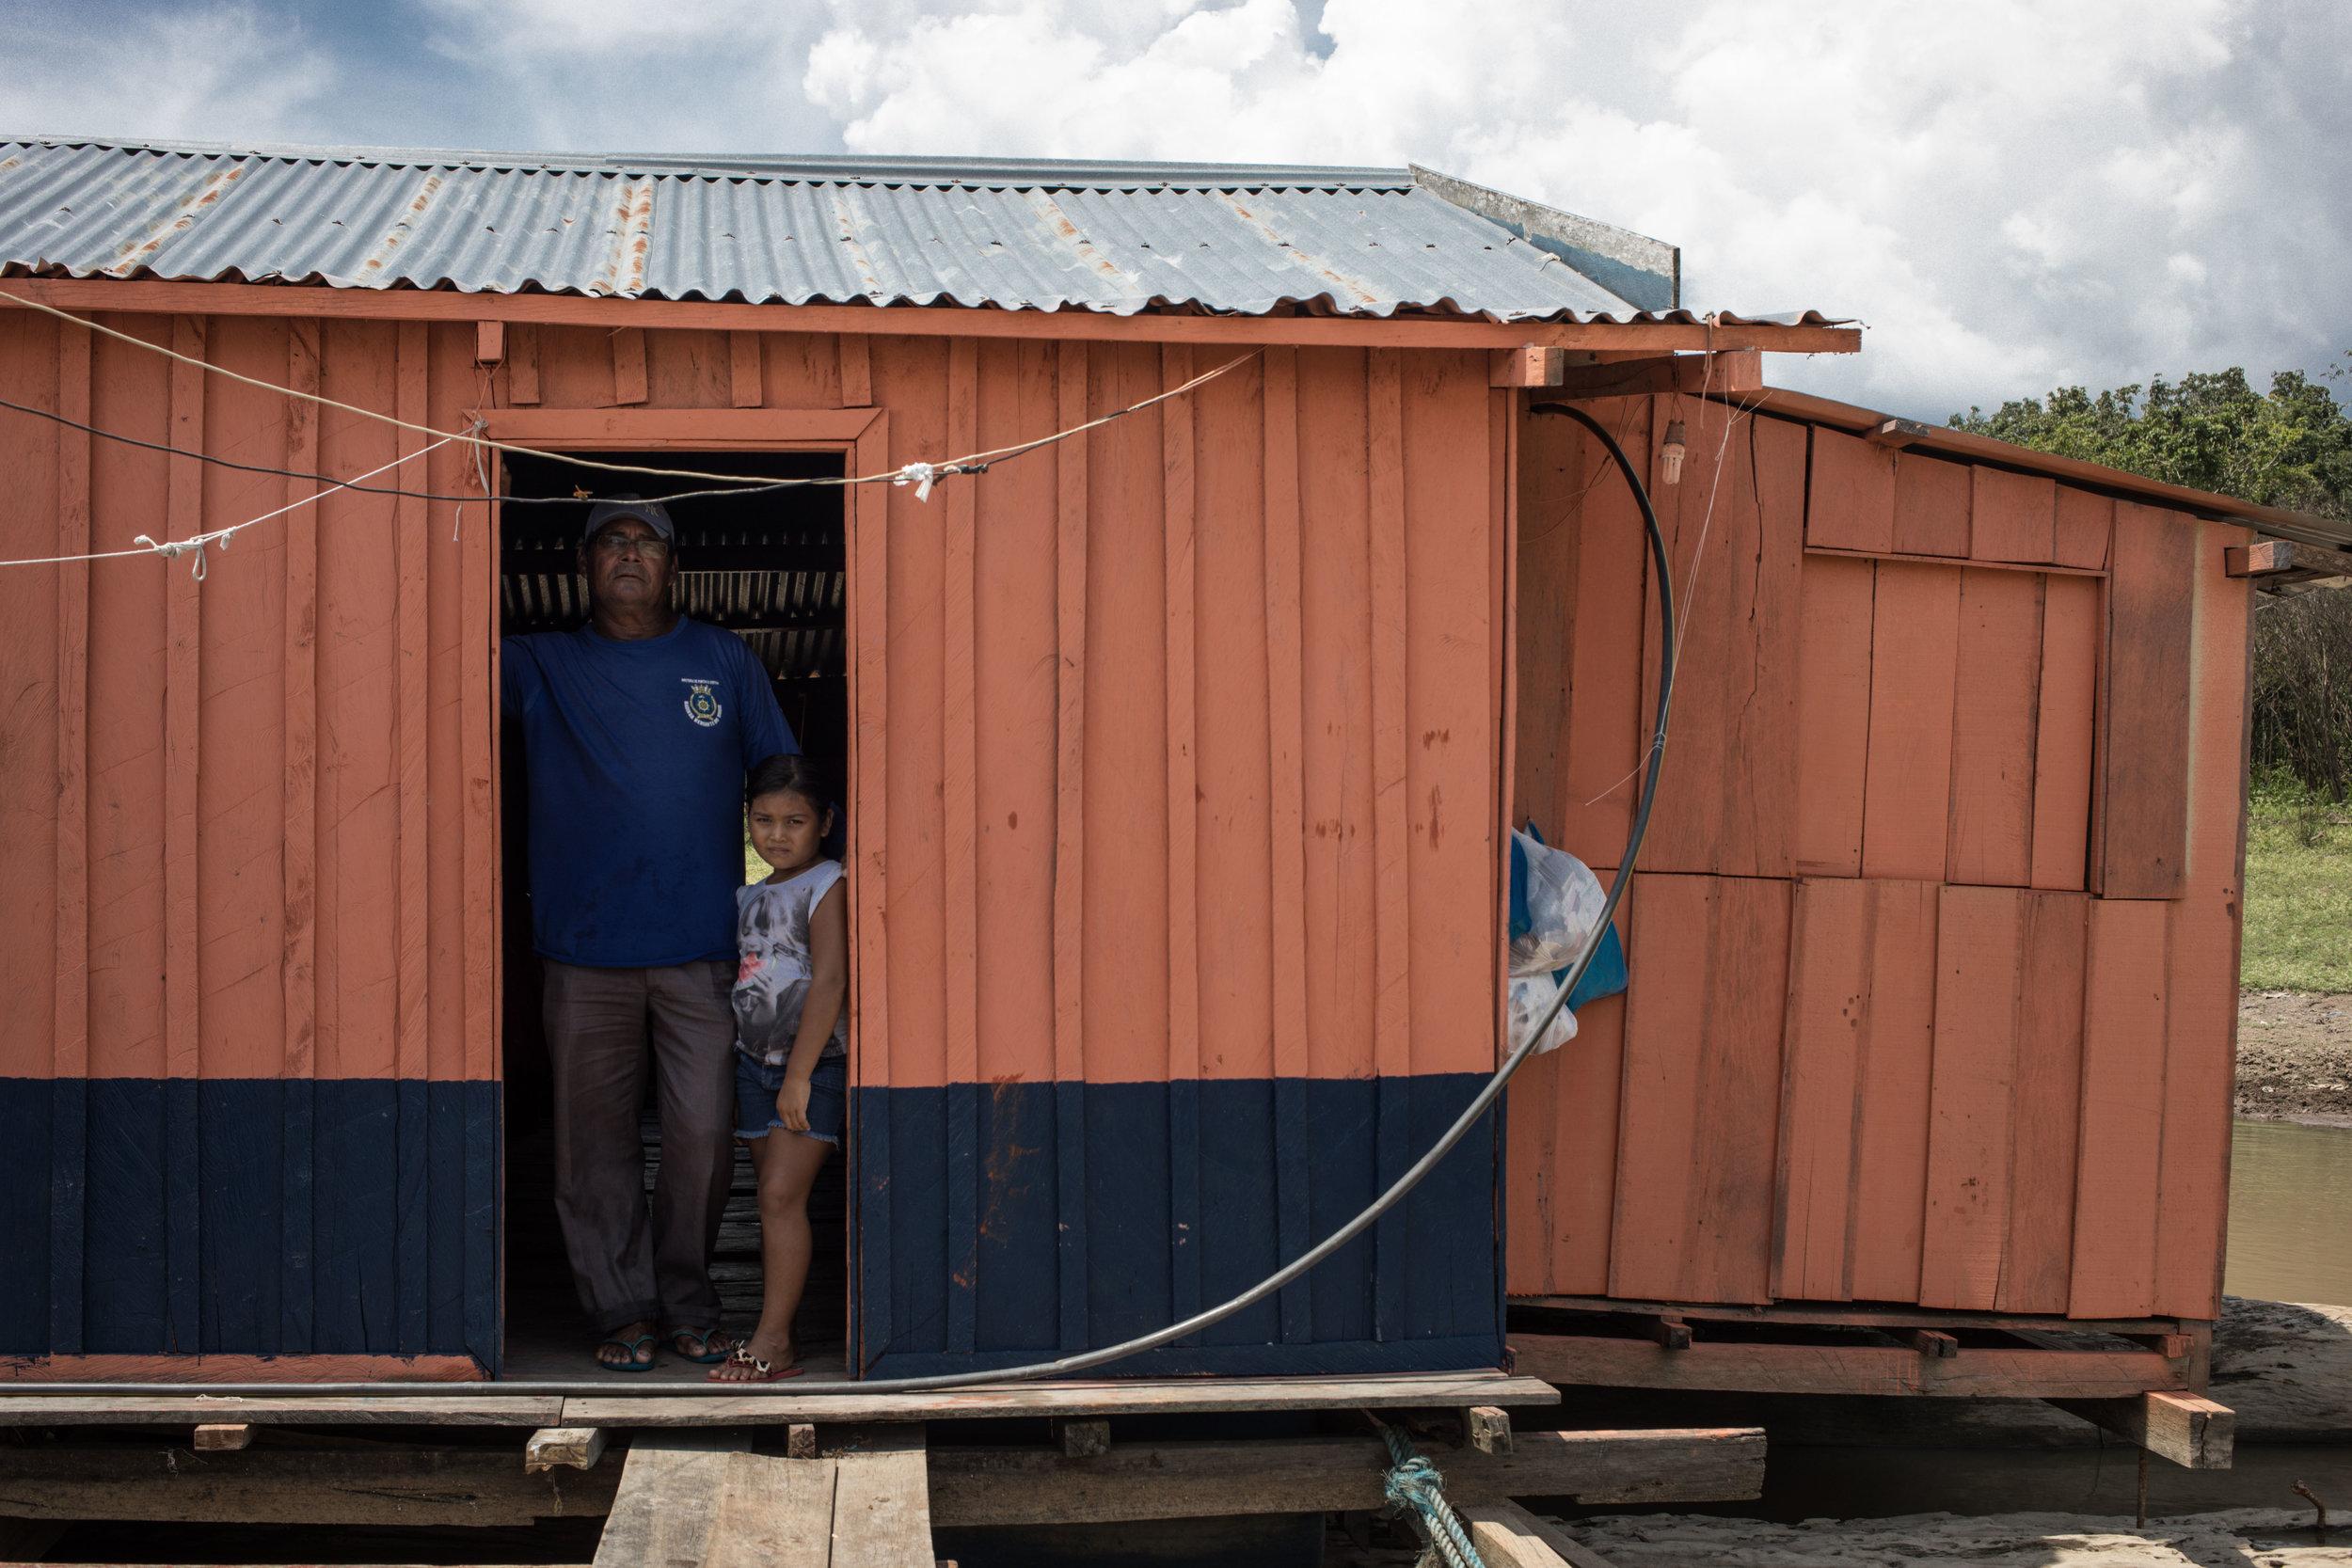 Floating Village in Manaus, Brazil